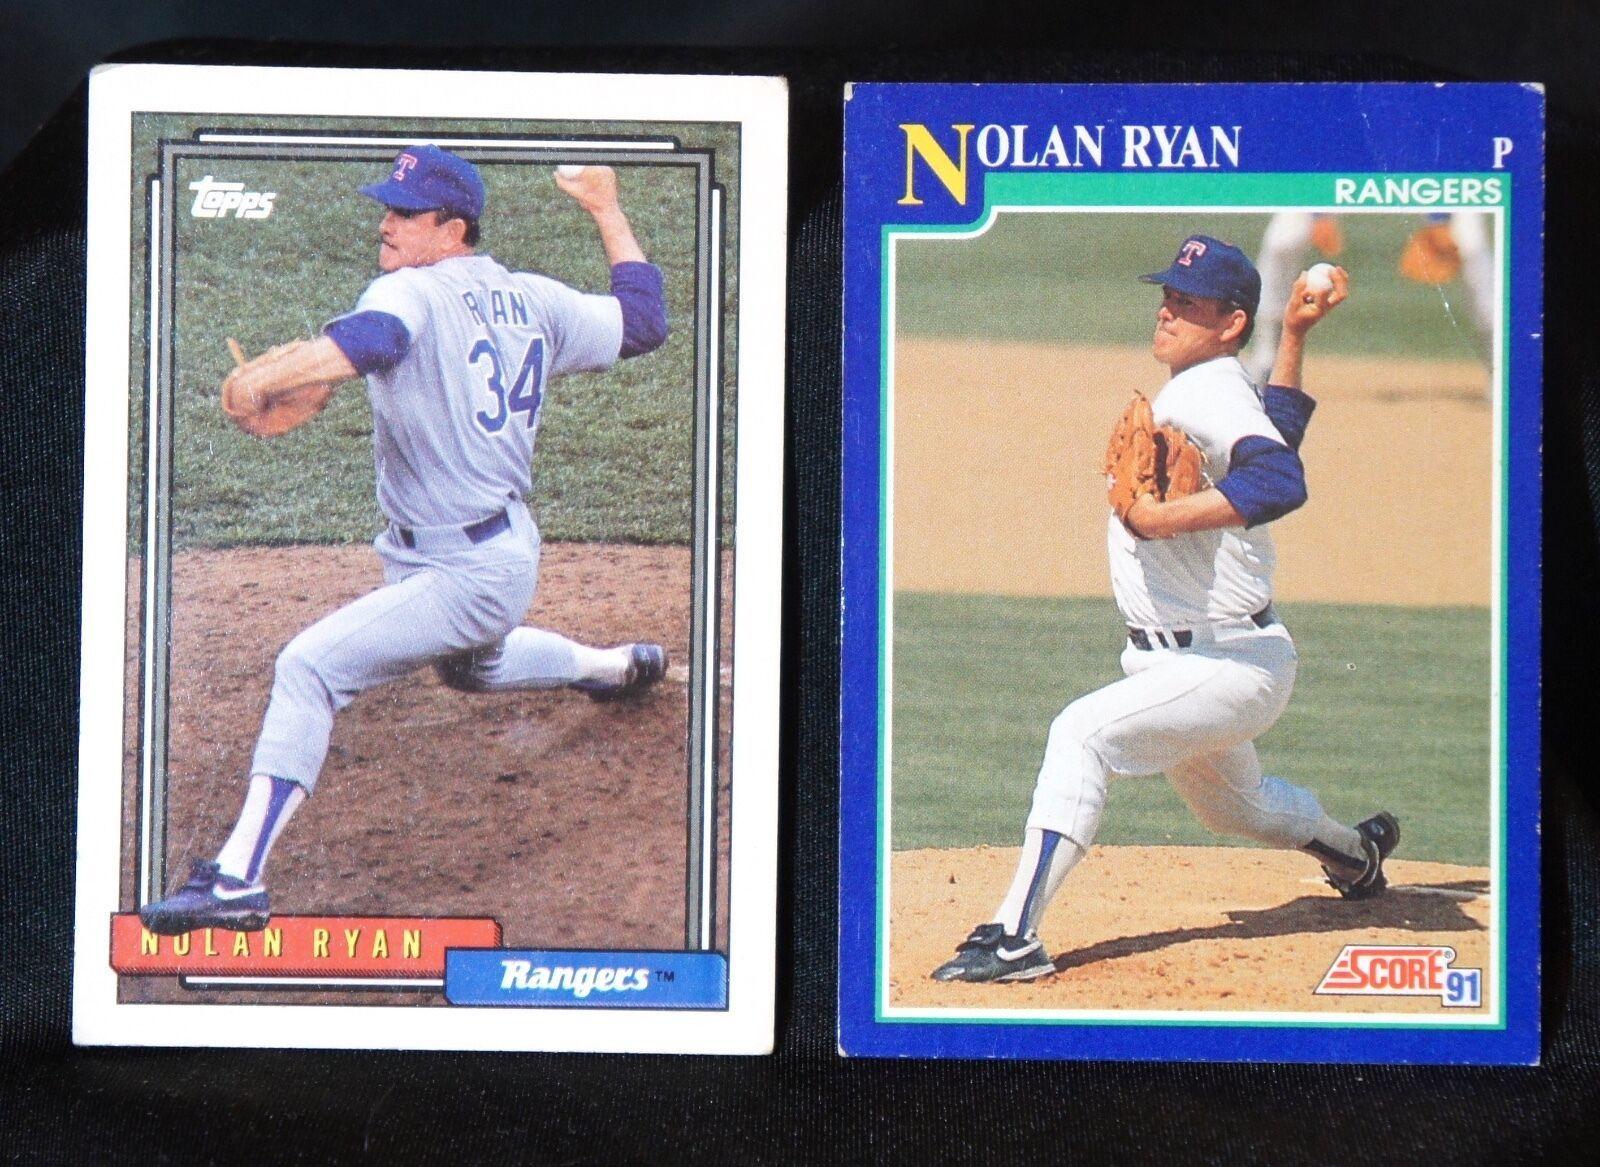 Nolan Ryan LOT of 2 baseball cards: Topps 1992, Score 1991, Texas Rangers